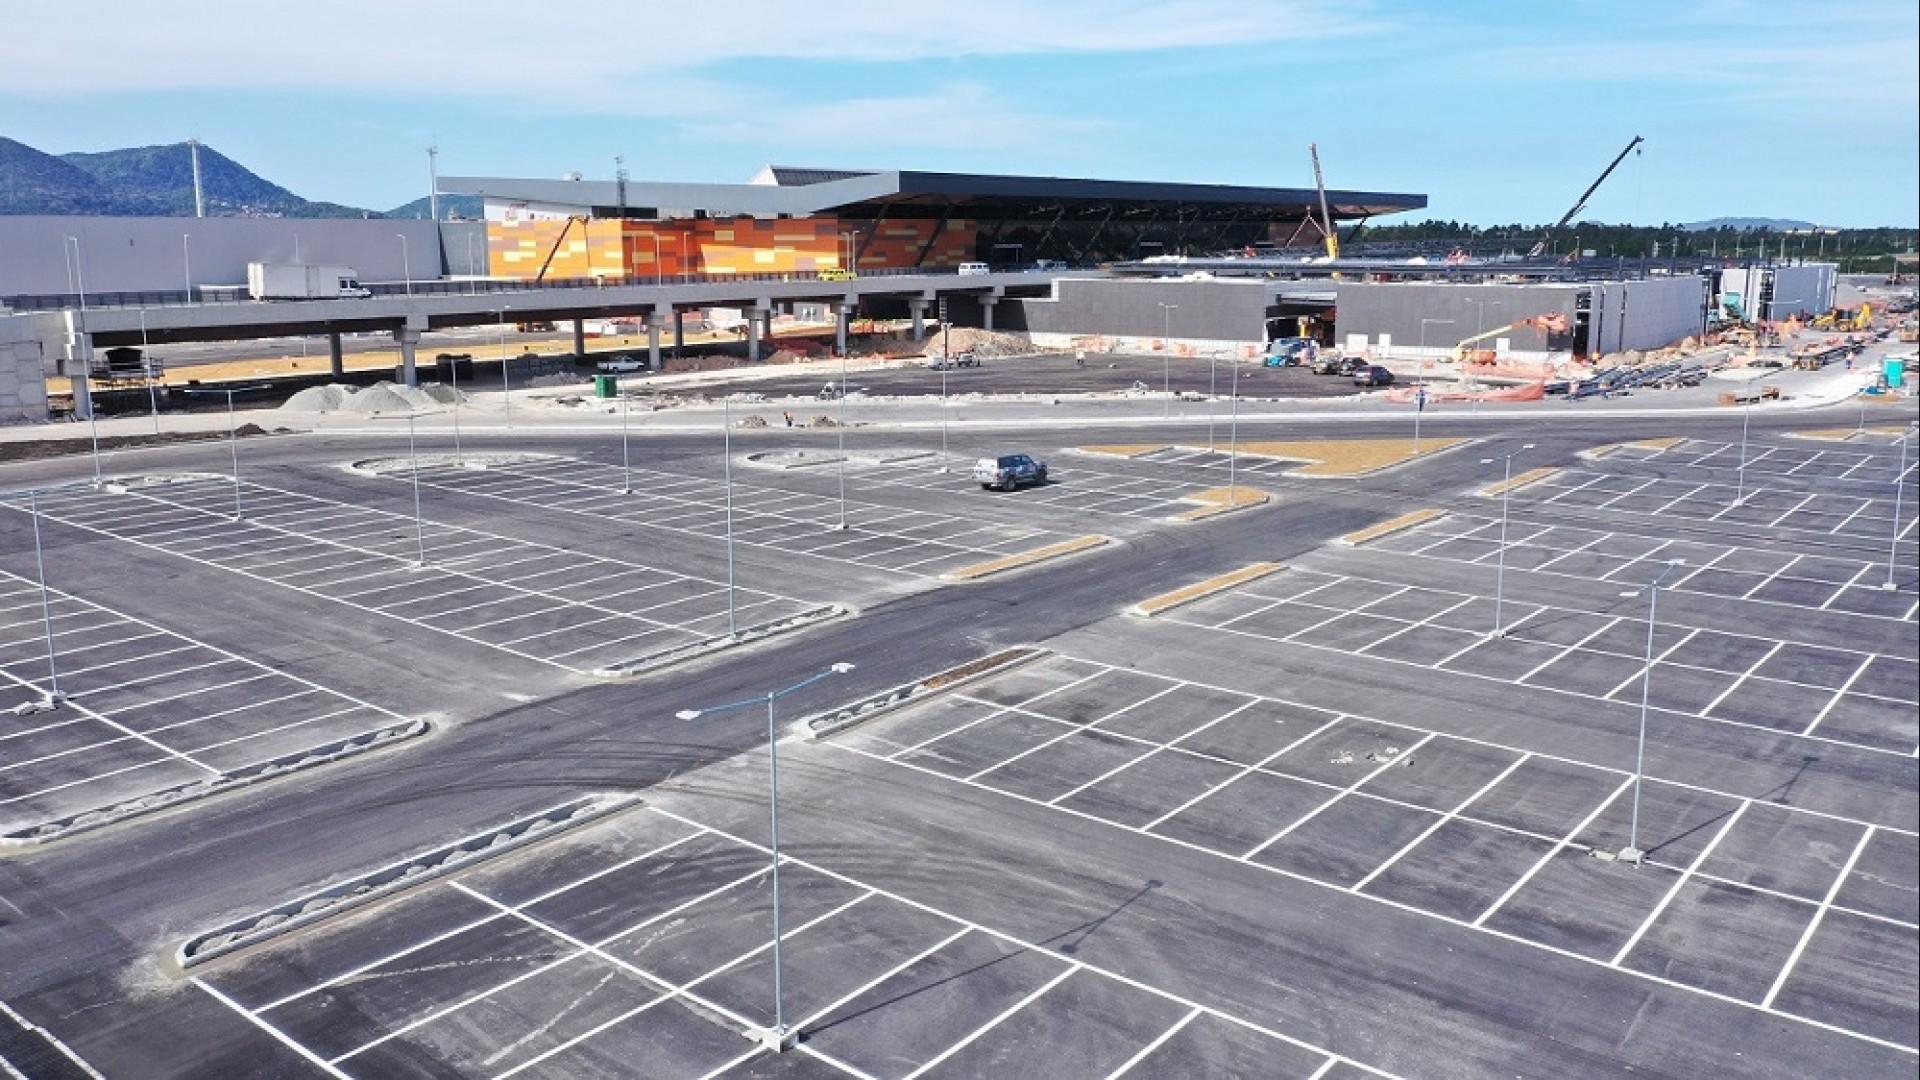 Estacionamento do Aeroporto de Florianópolis